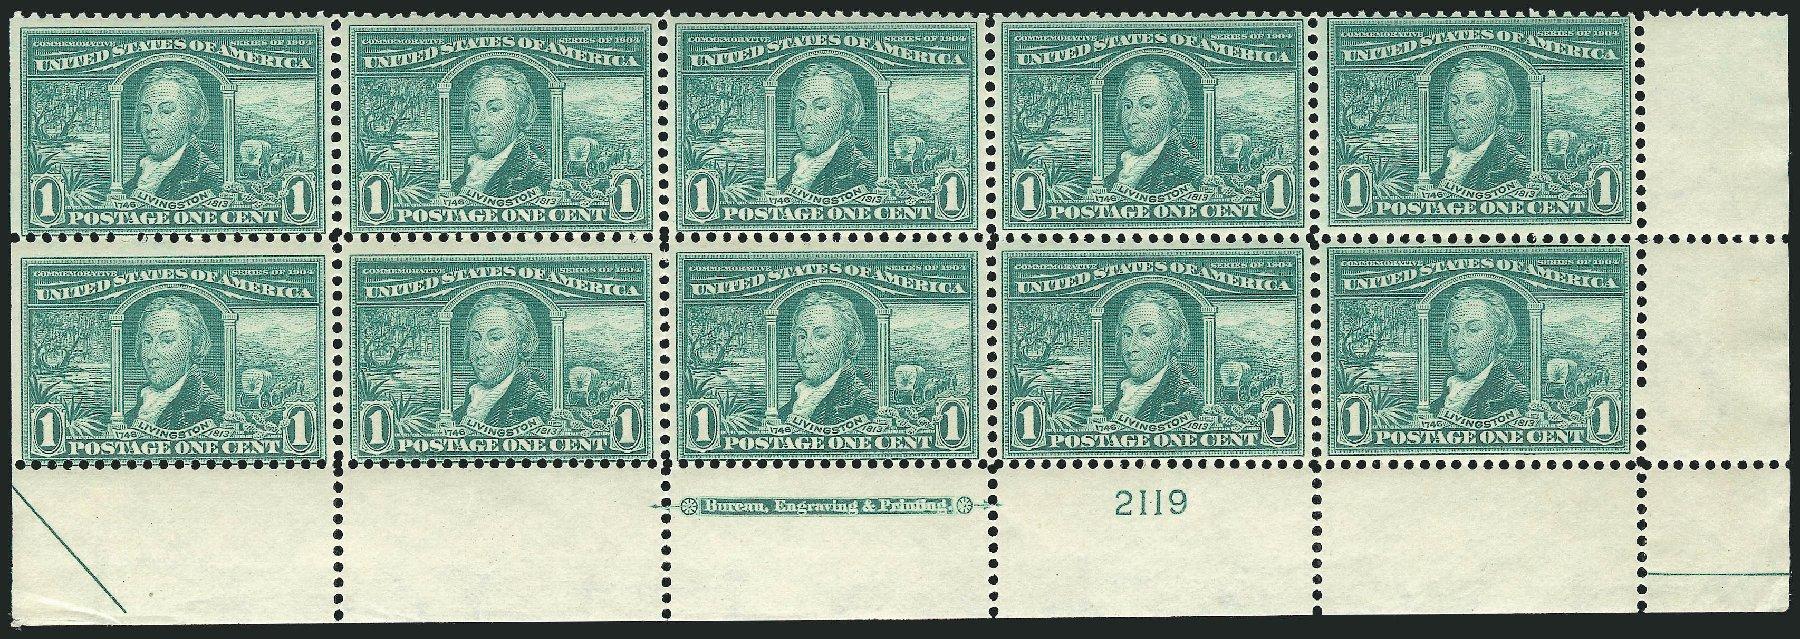 Cost of US Stamps Scott Cat. # 323 - 1c 1904 Louisiana Purchase Exposition. Robert Siegel Auction Galleries, Jul 2014, Sale 1077, Lot 228